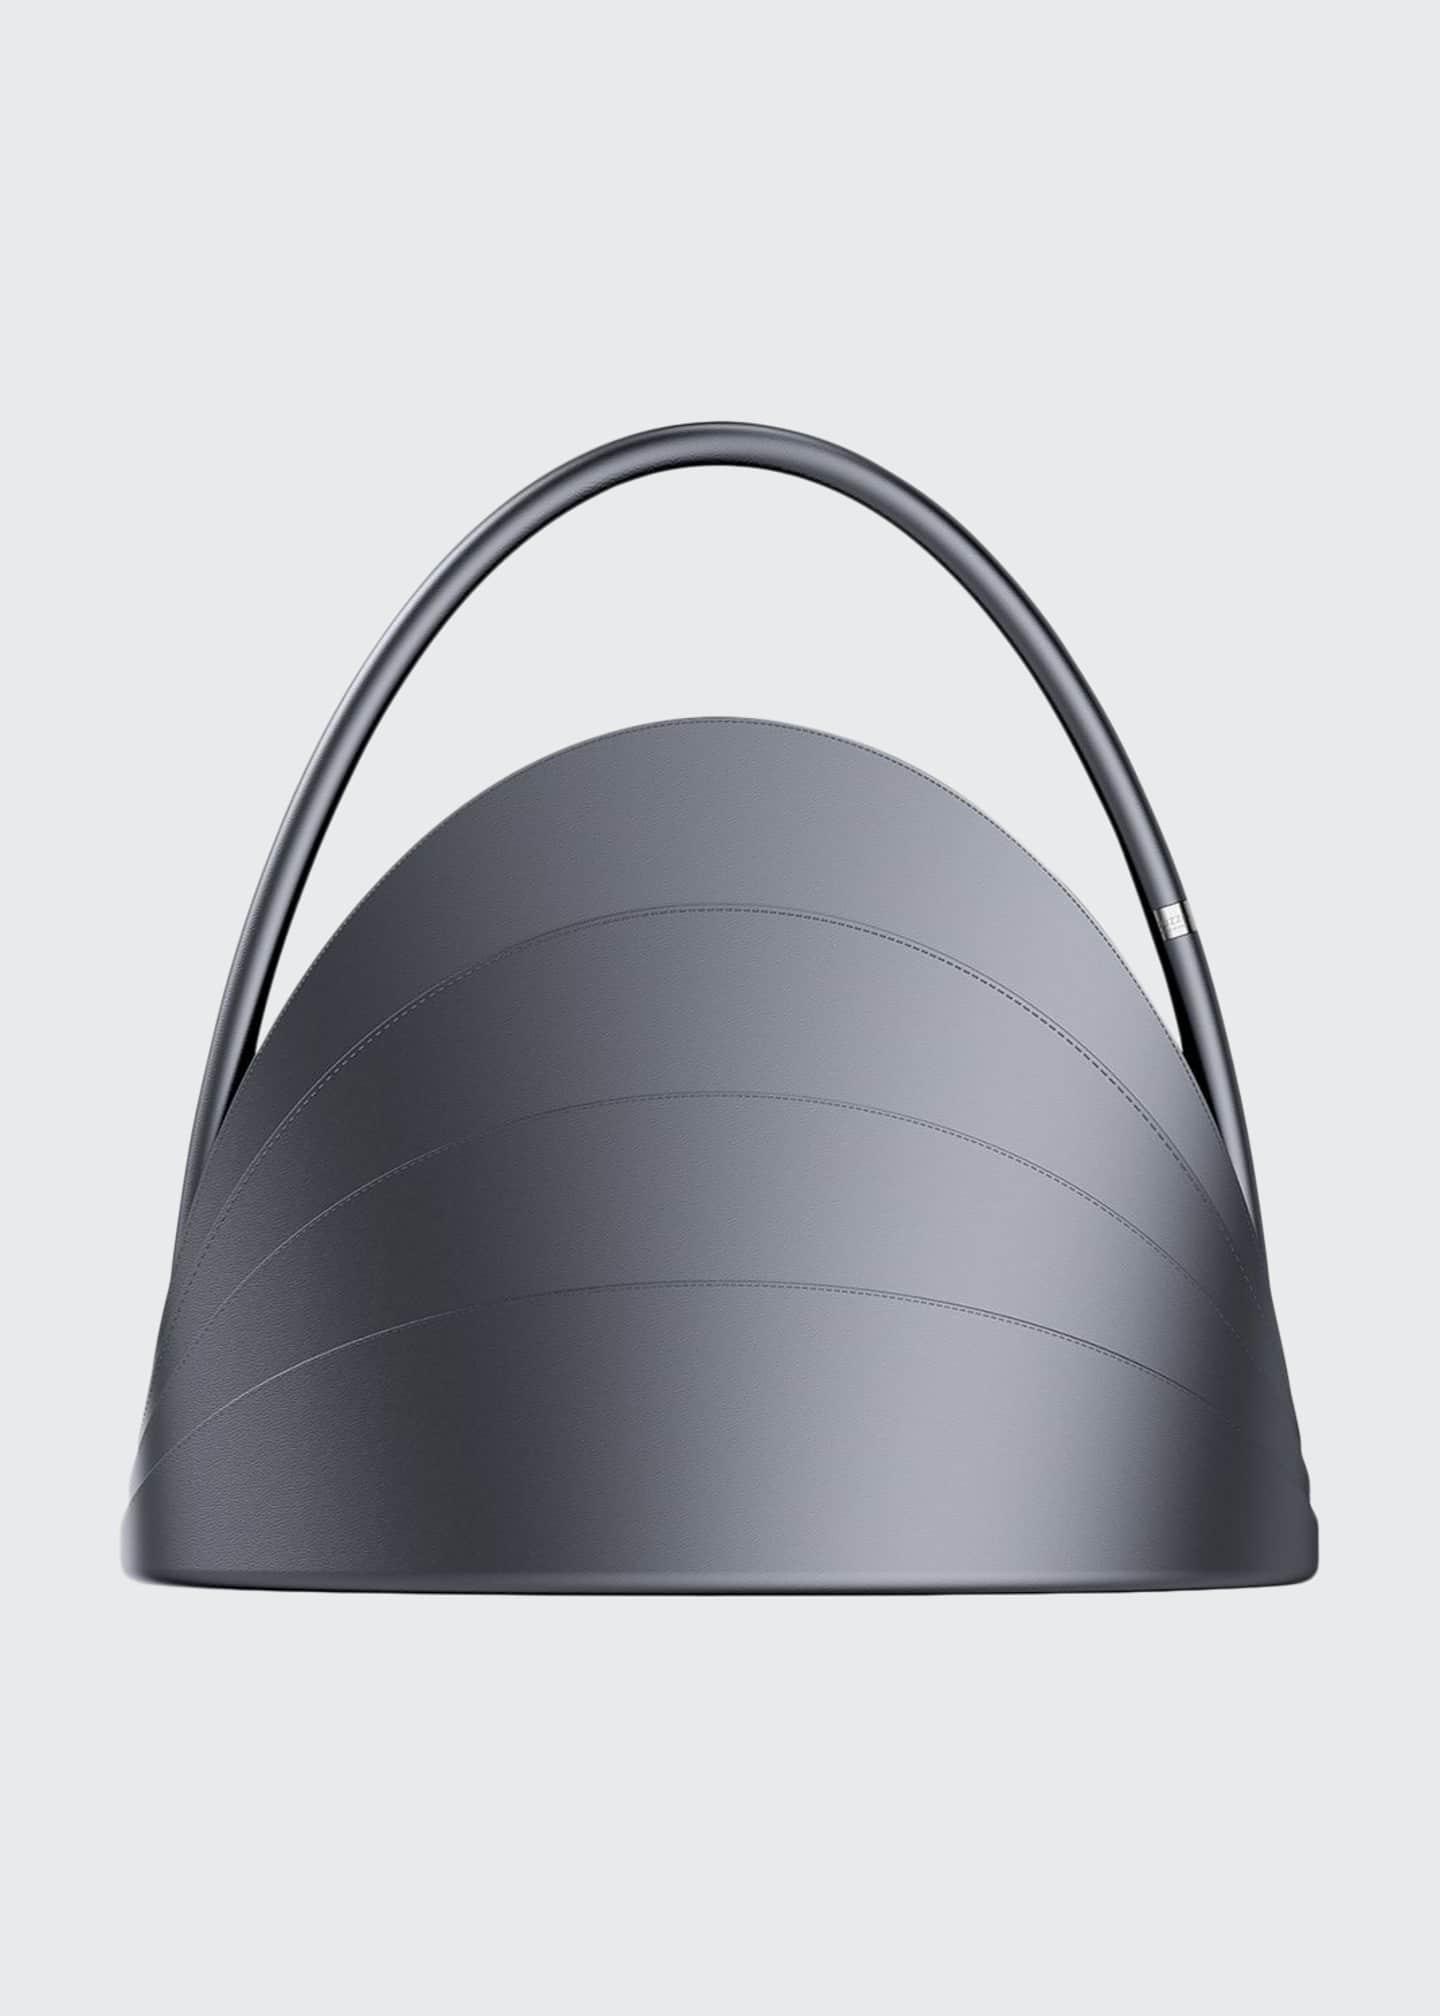 Gabo Guzzo Millefoglie Layered Top-Handle Bag, Gray